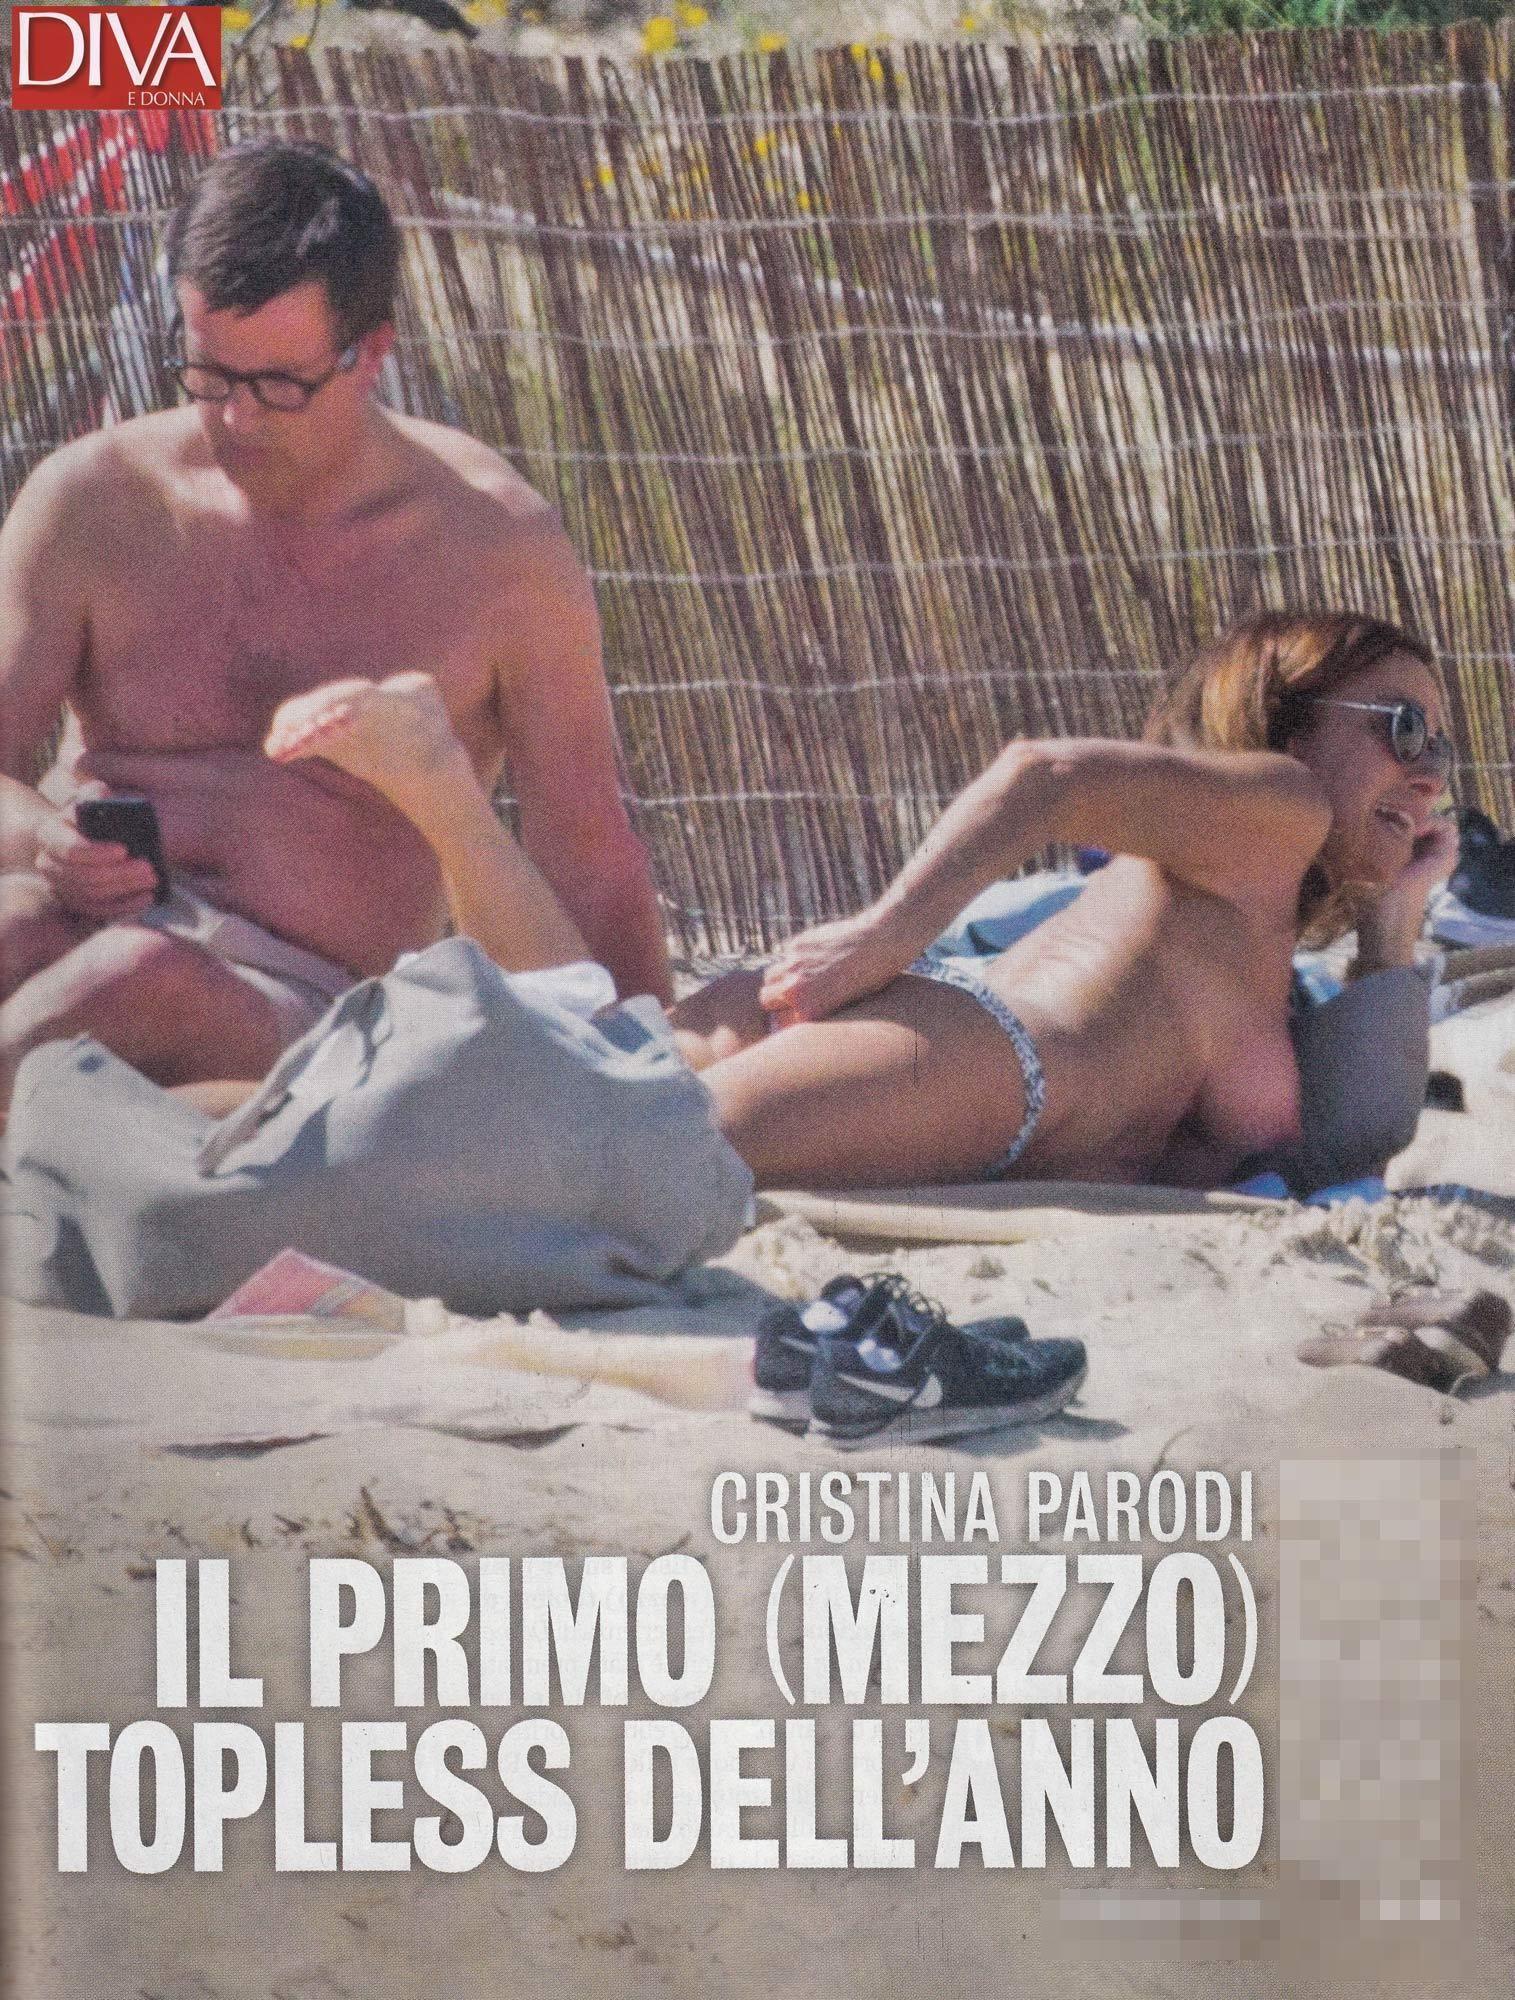 Cristina Parodi : topless 2018 a Formentera